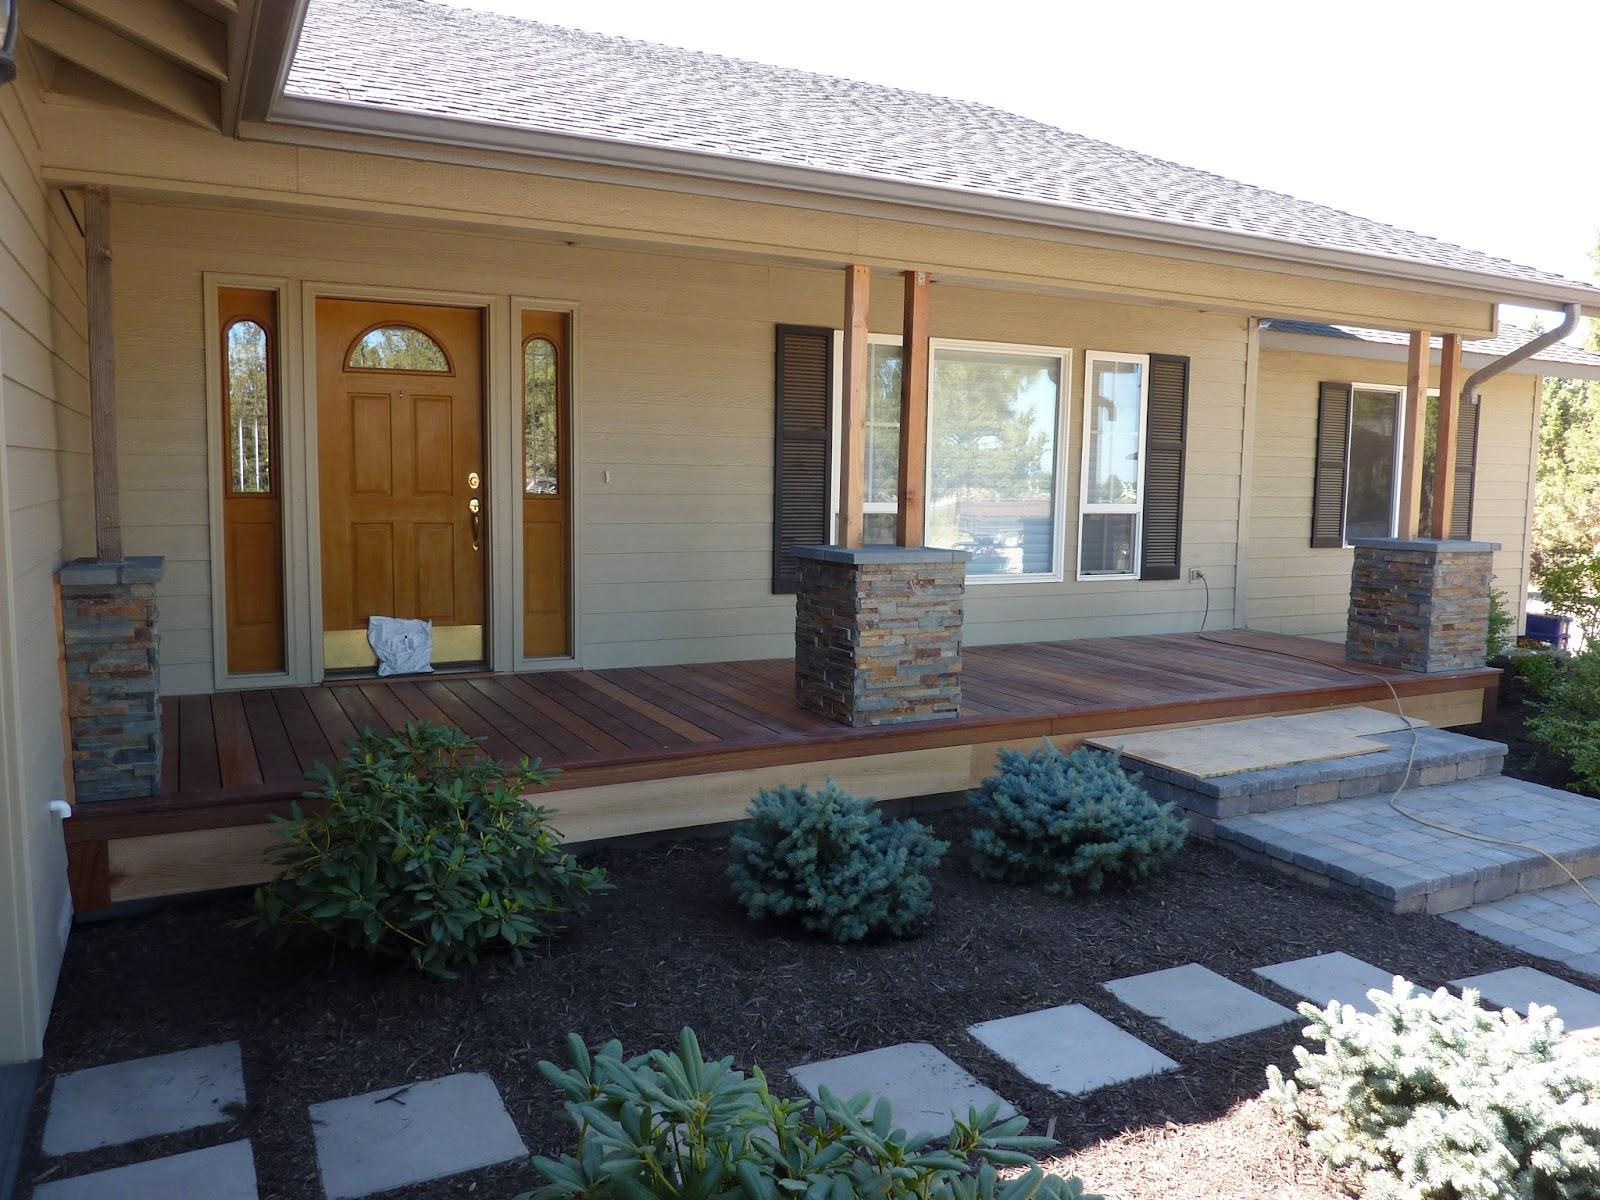 Boisineau masonry rox pro craftsman autumn horizon stone for Craftsman stone